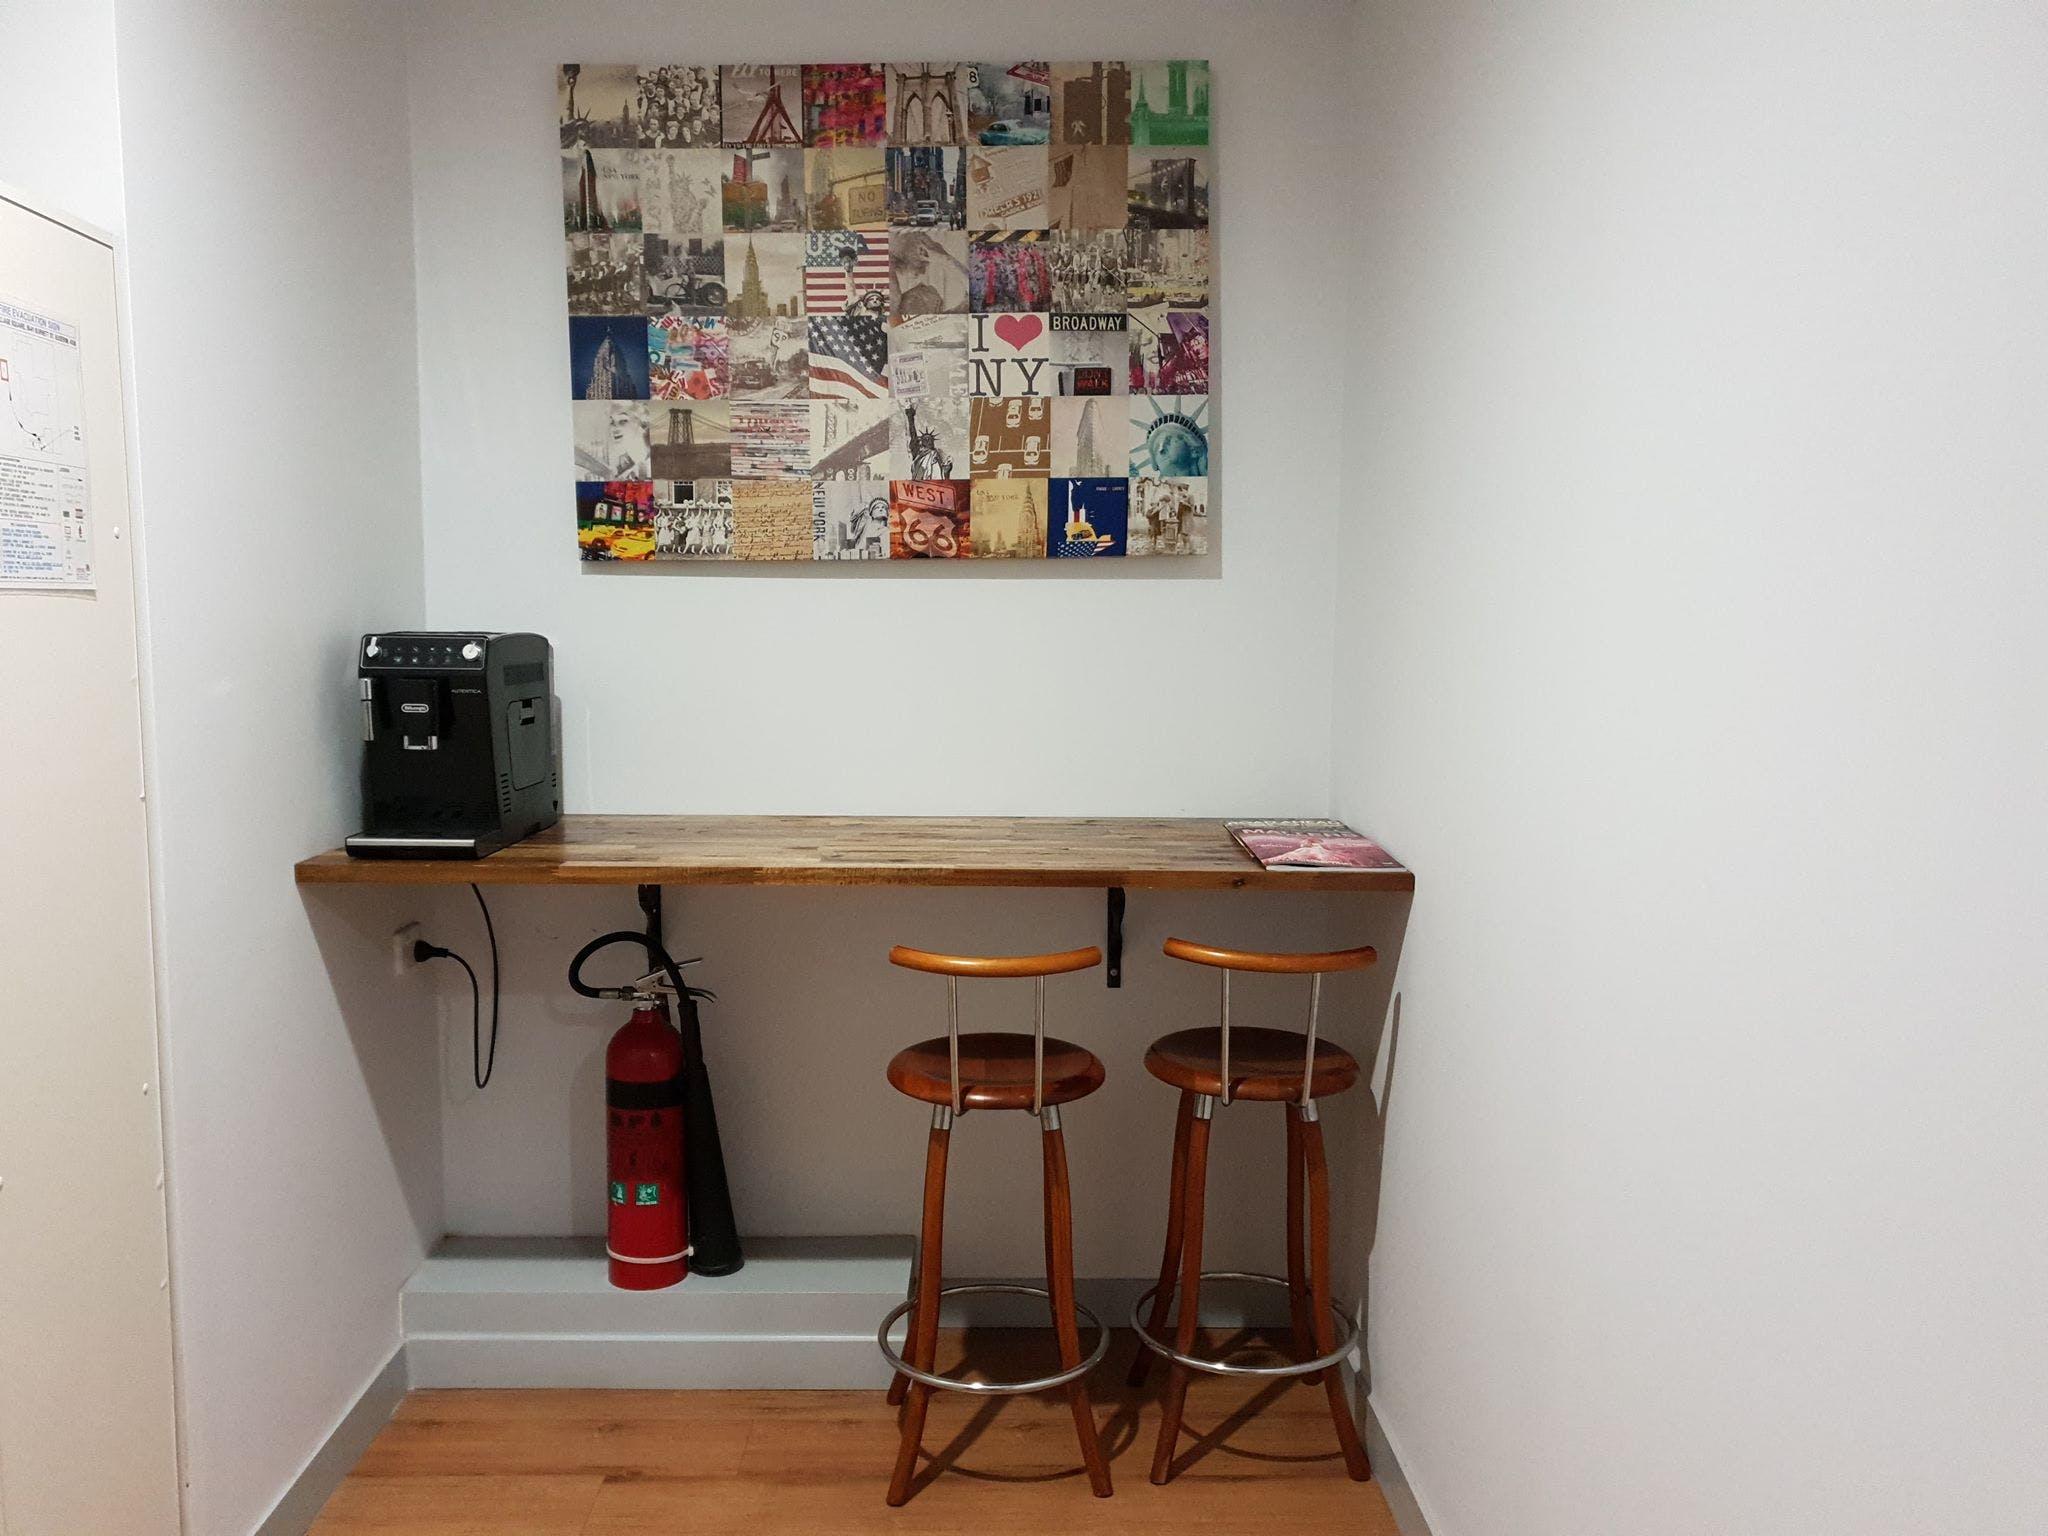 Meeting room at Buderim Hot Desks, image 4